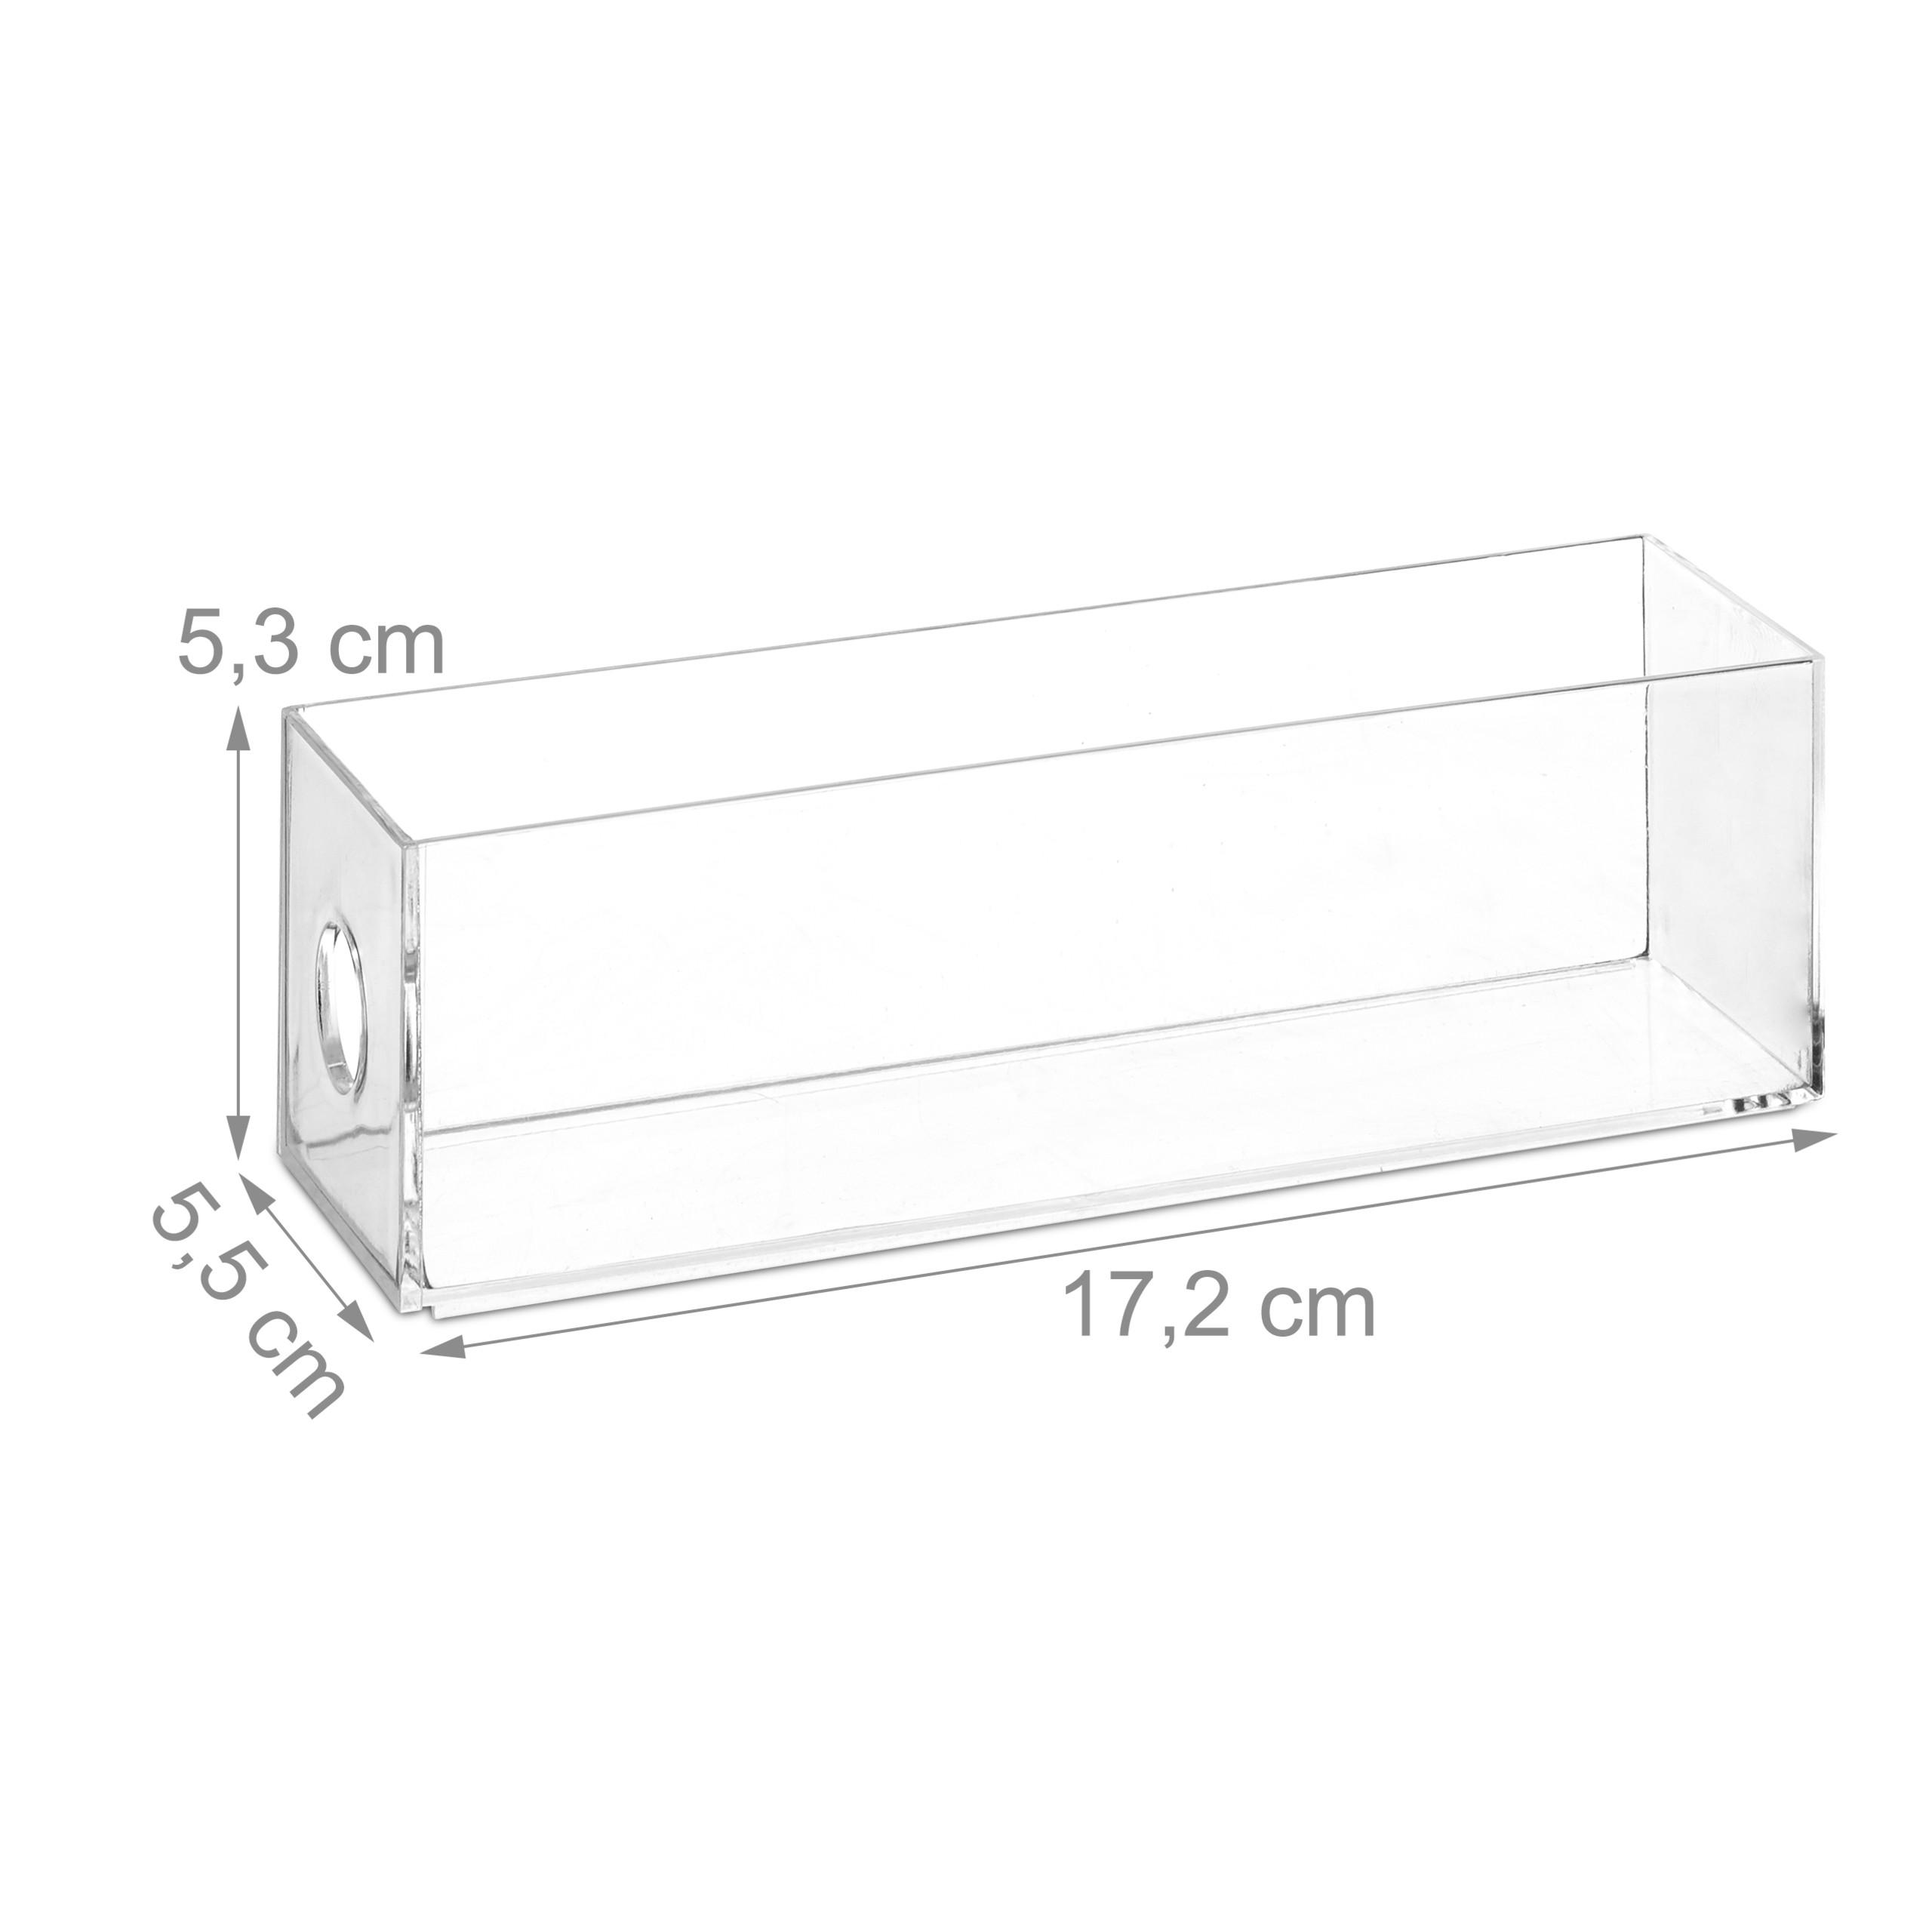 Transparent-Make-Up-Organiser-Storage-Box-with-4-Drawers thumbnail 7